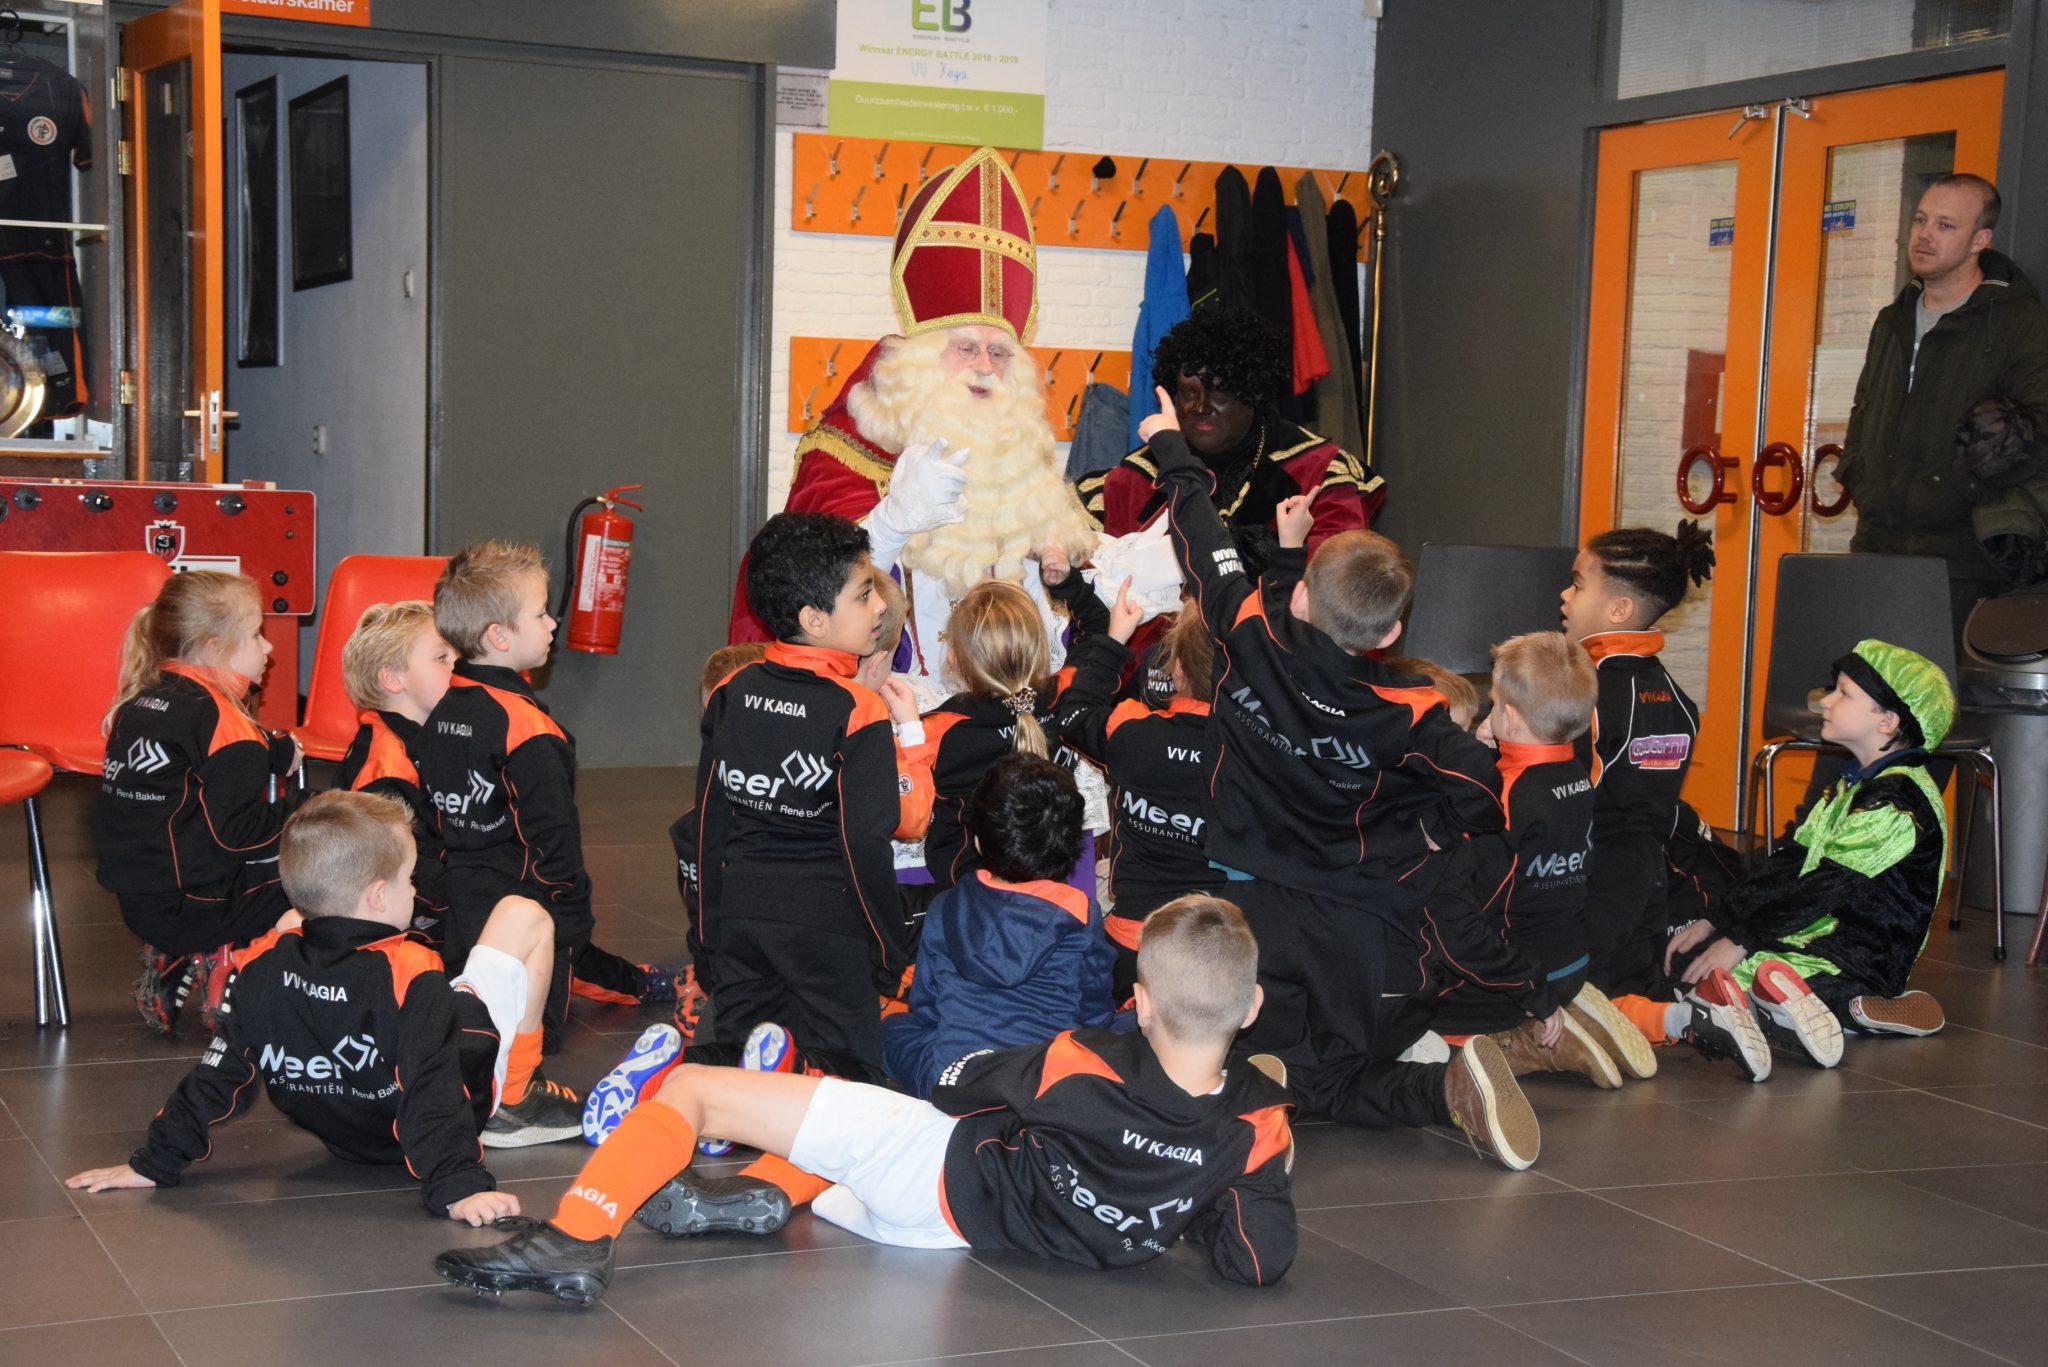 Foto's Sinterklaas 2019 (27/11/2019)